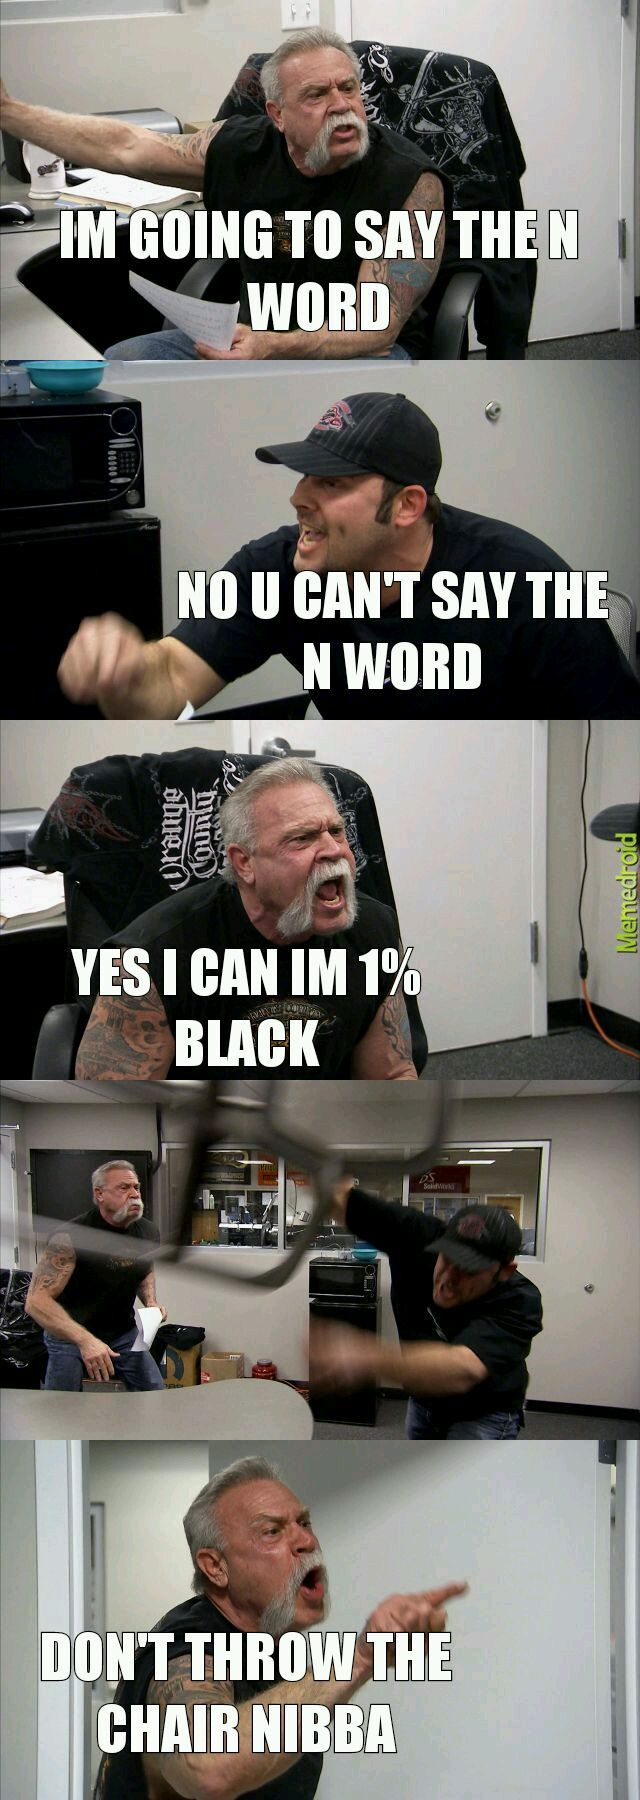 2019 xbox 9 yr olds - meme